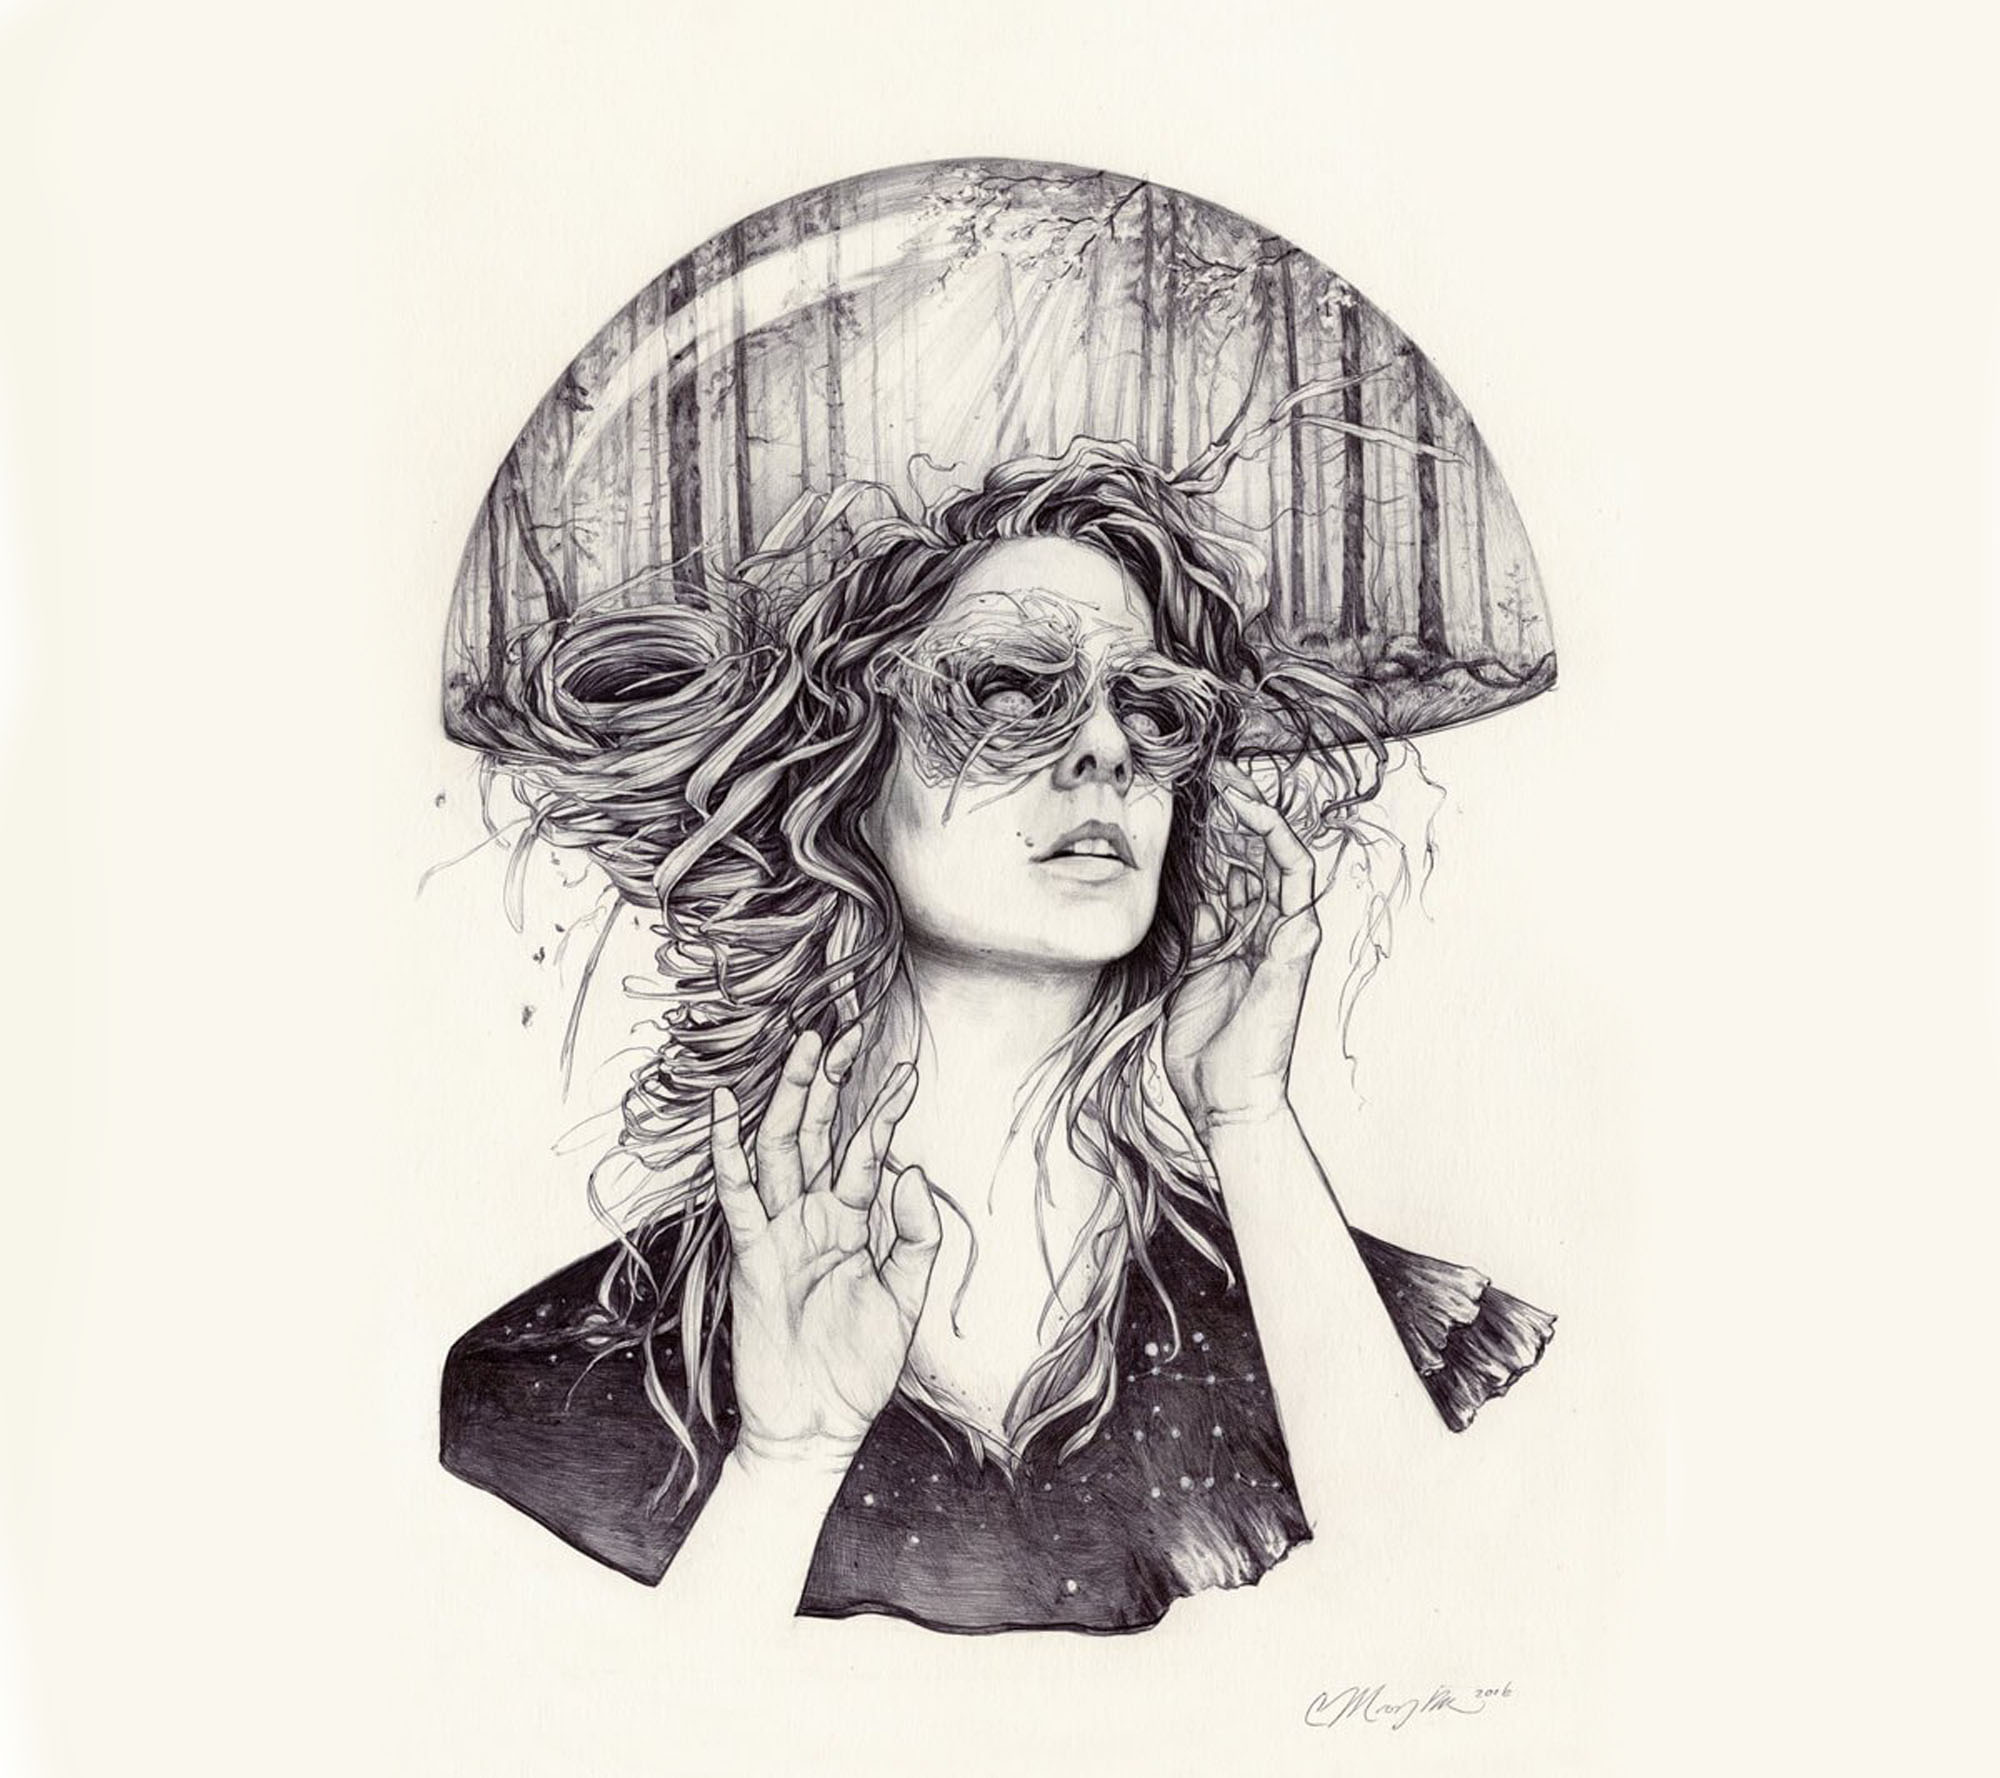 surreal portrait by christina mrozik